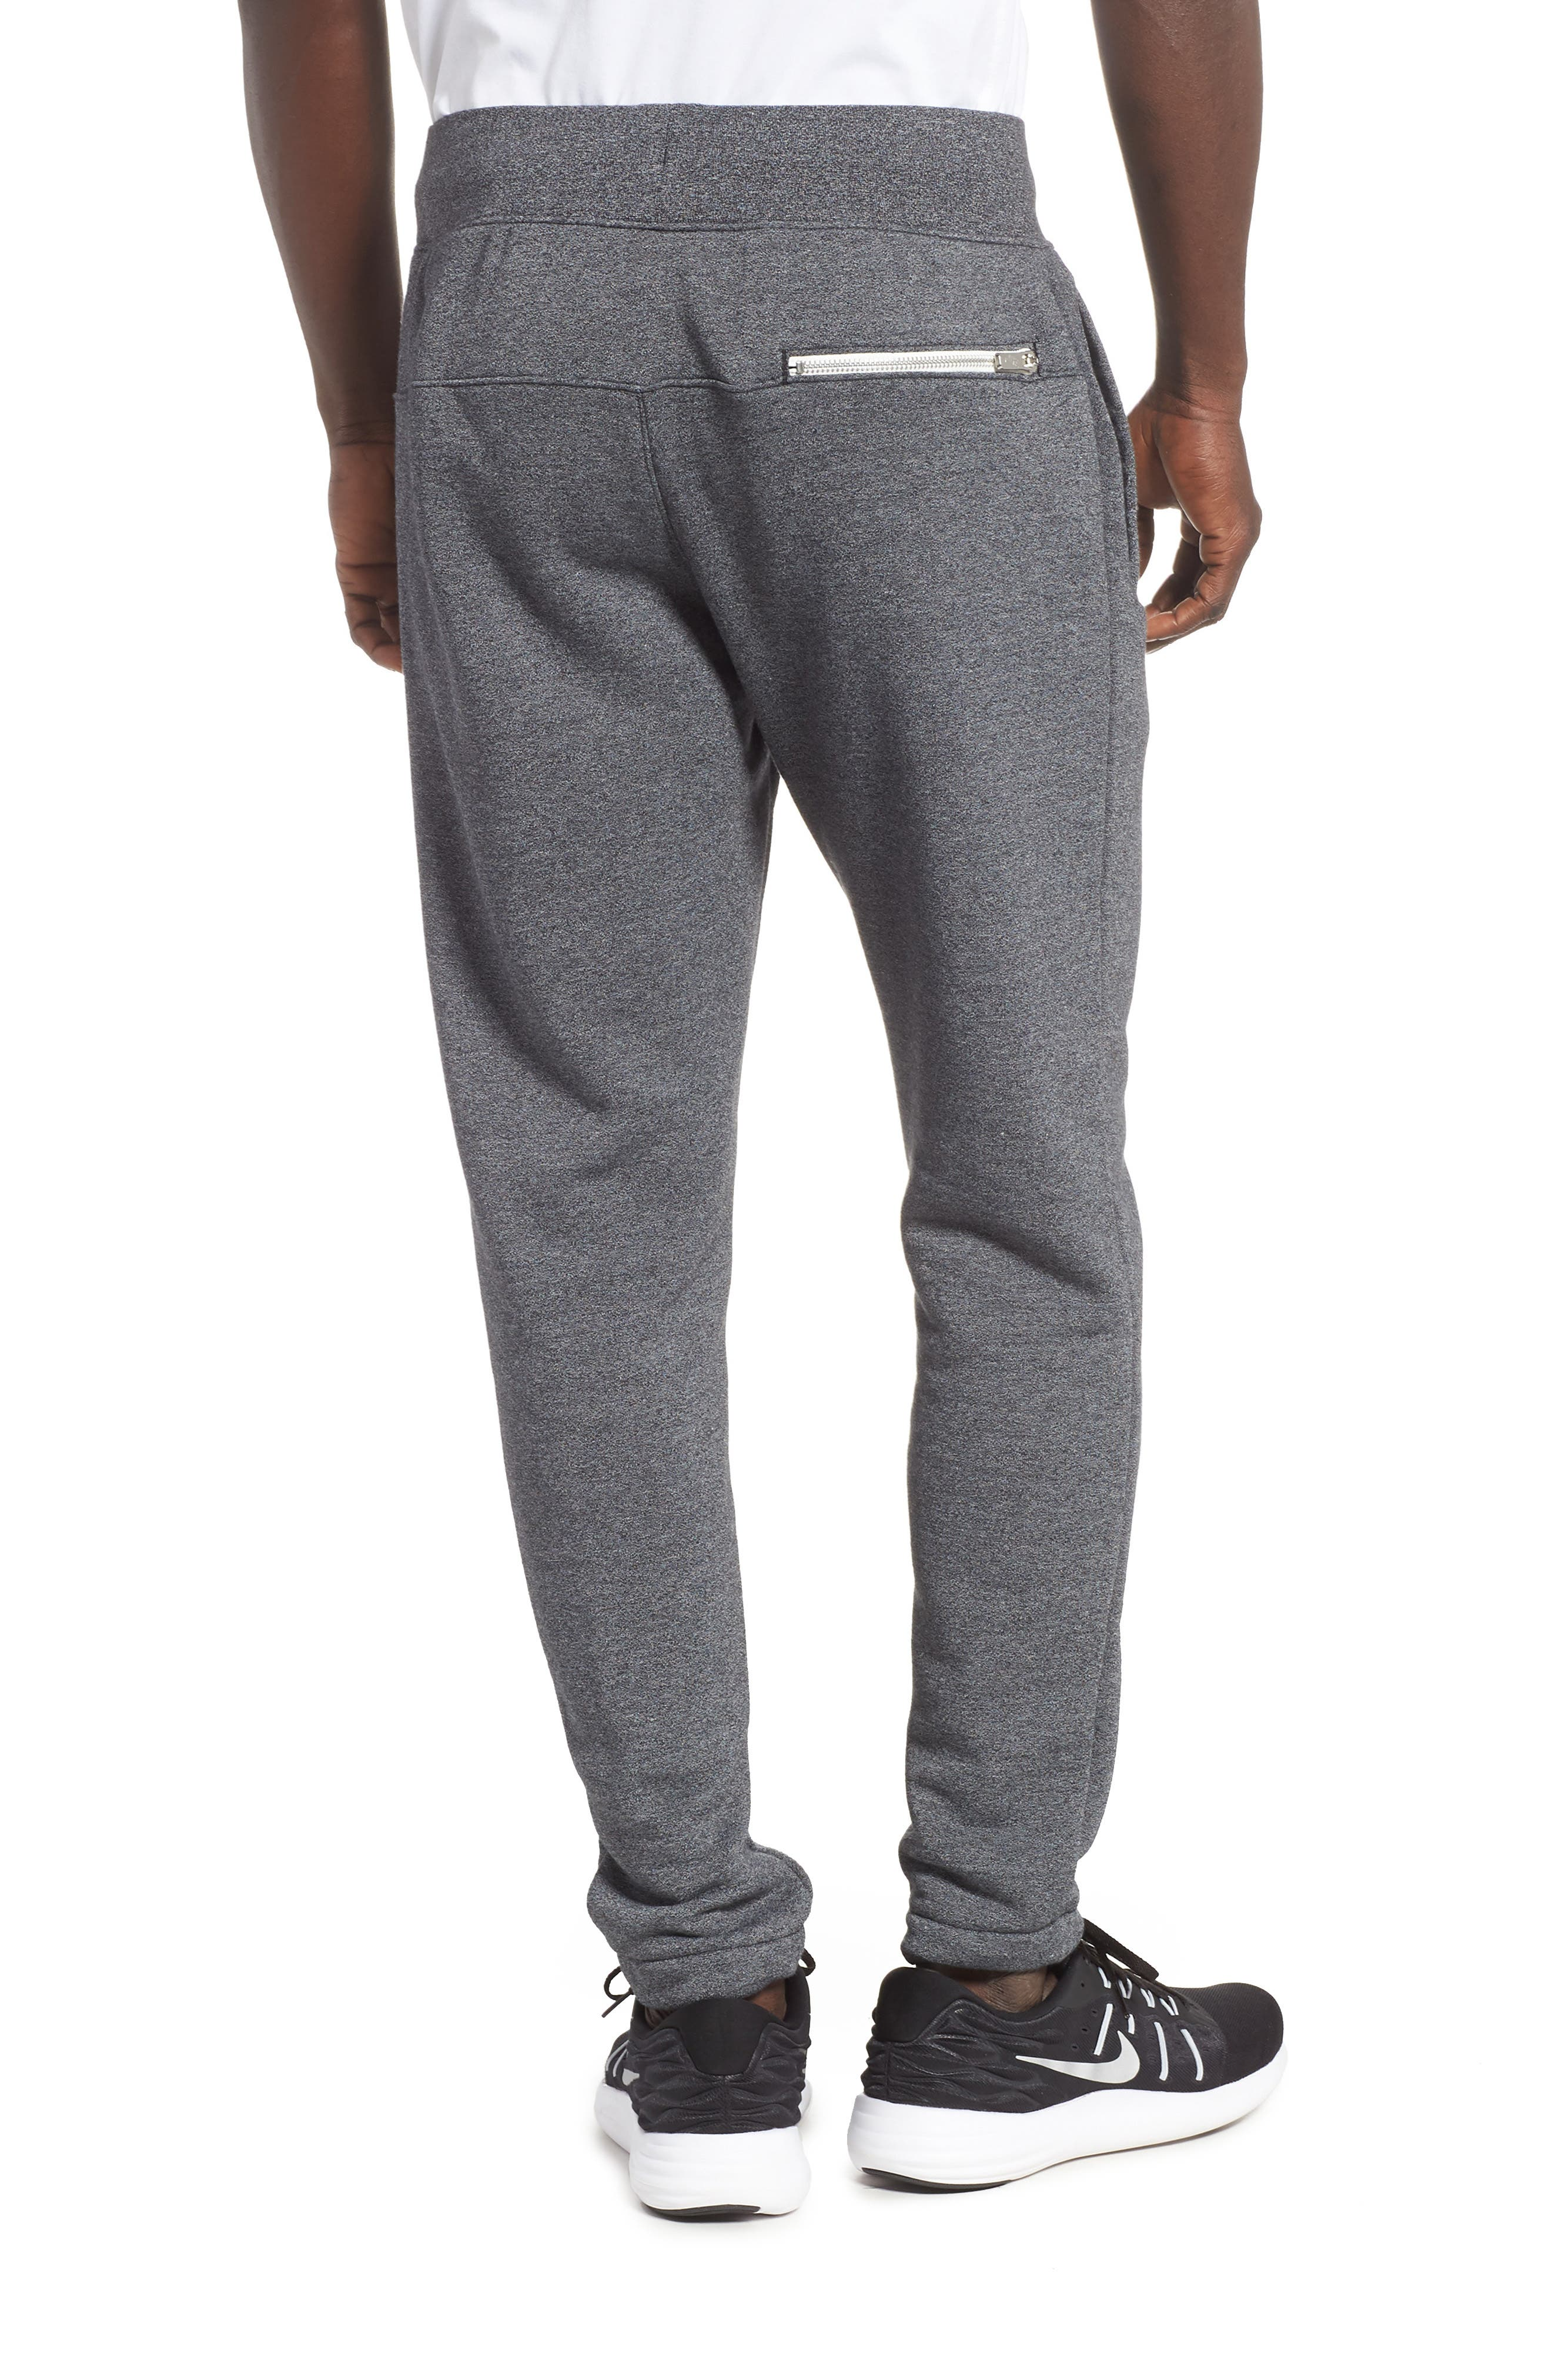 Sportswear ACG Heritage Pants,                             Alternate thumbnail 2, color,                             BLACK/ HTR/ SAIL